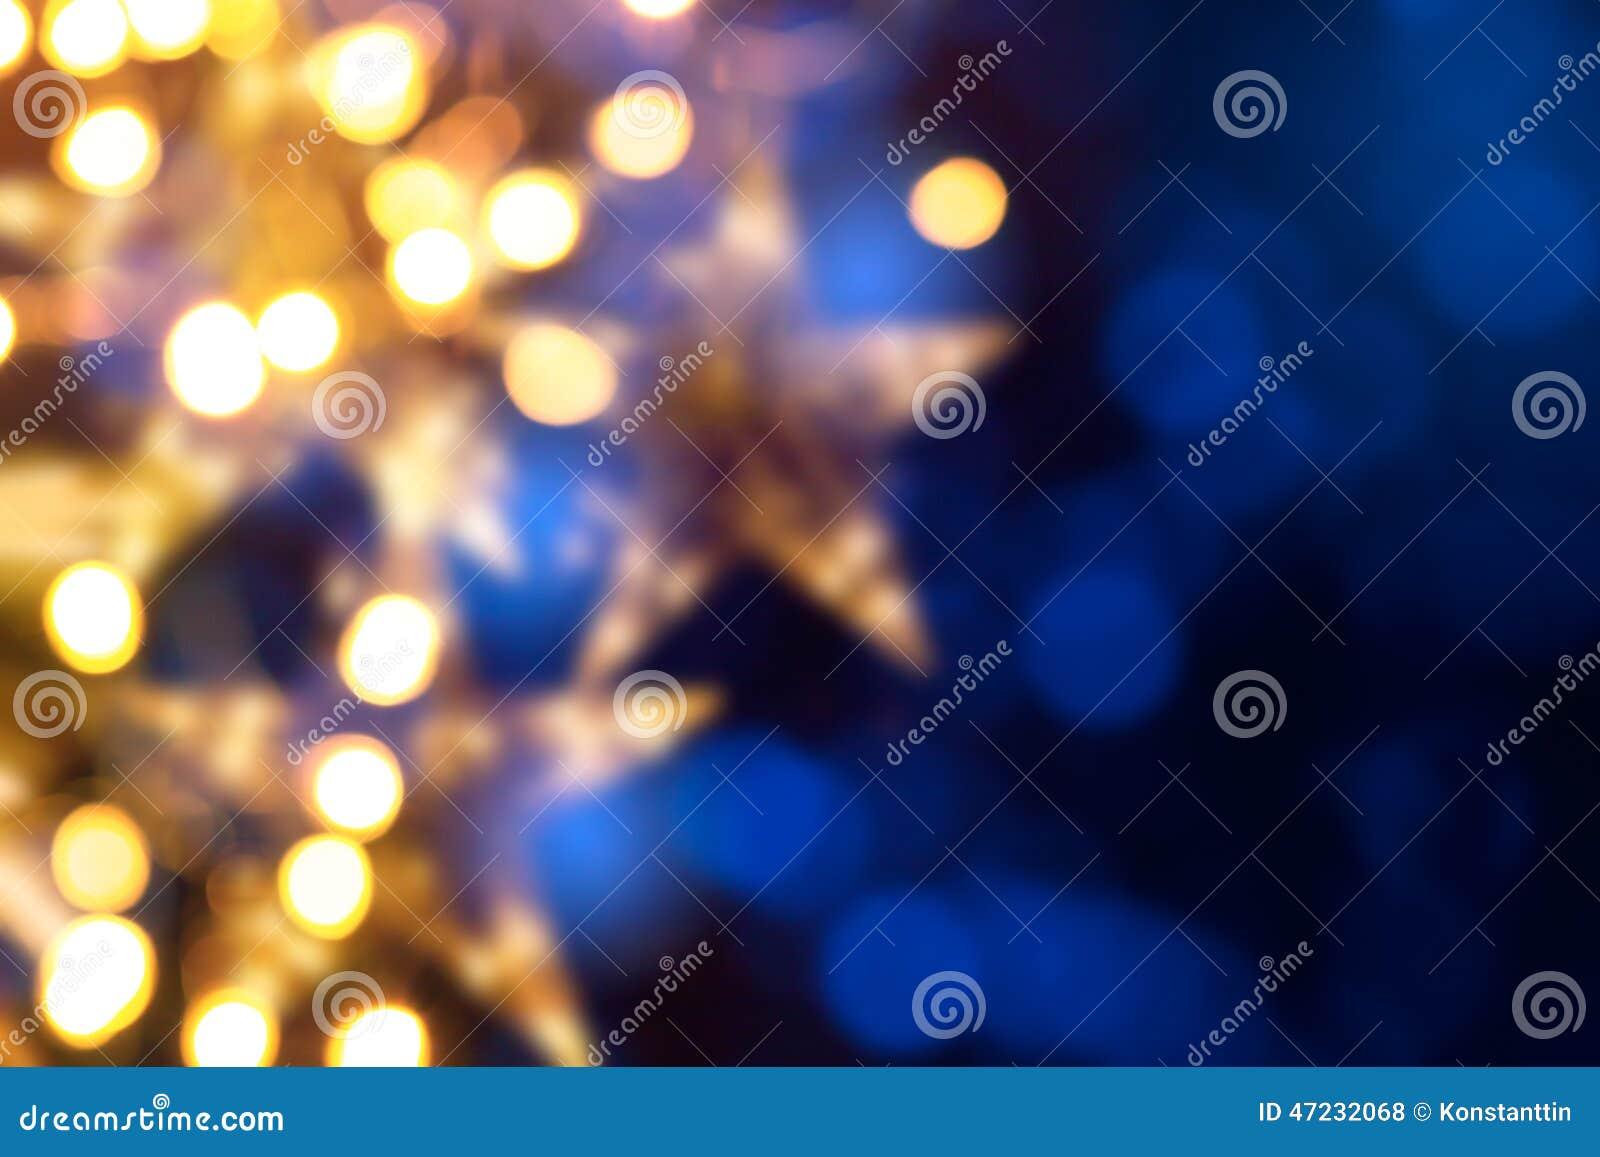 Art Christmas holidays lights